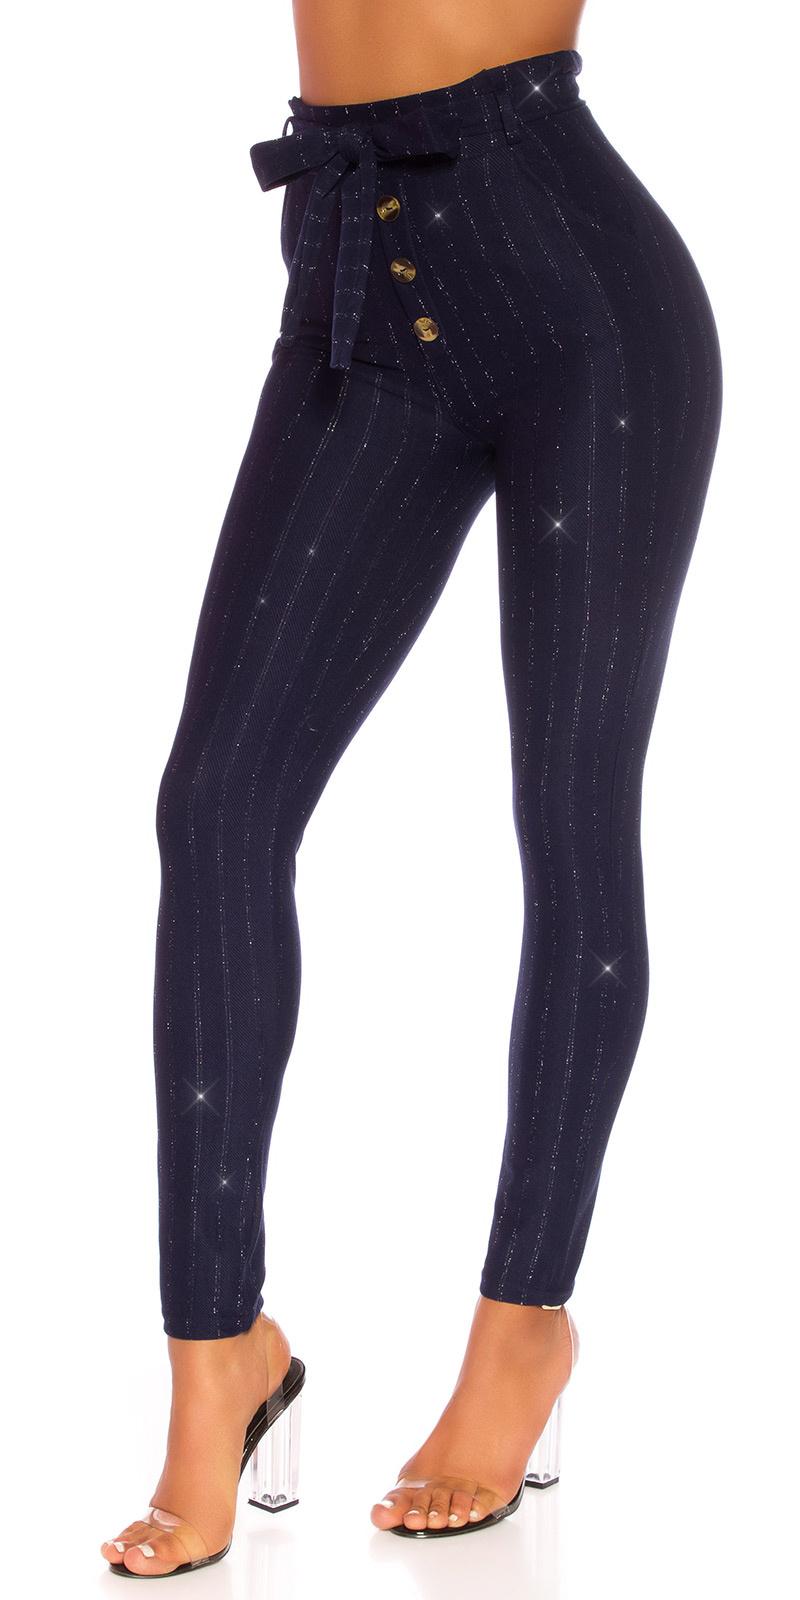 Sexy hoge taille broek met glitter en riem marineblauw